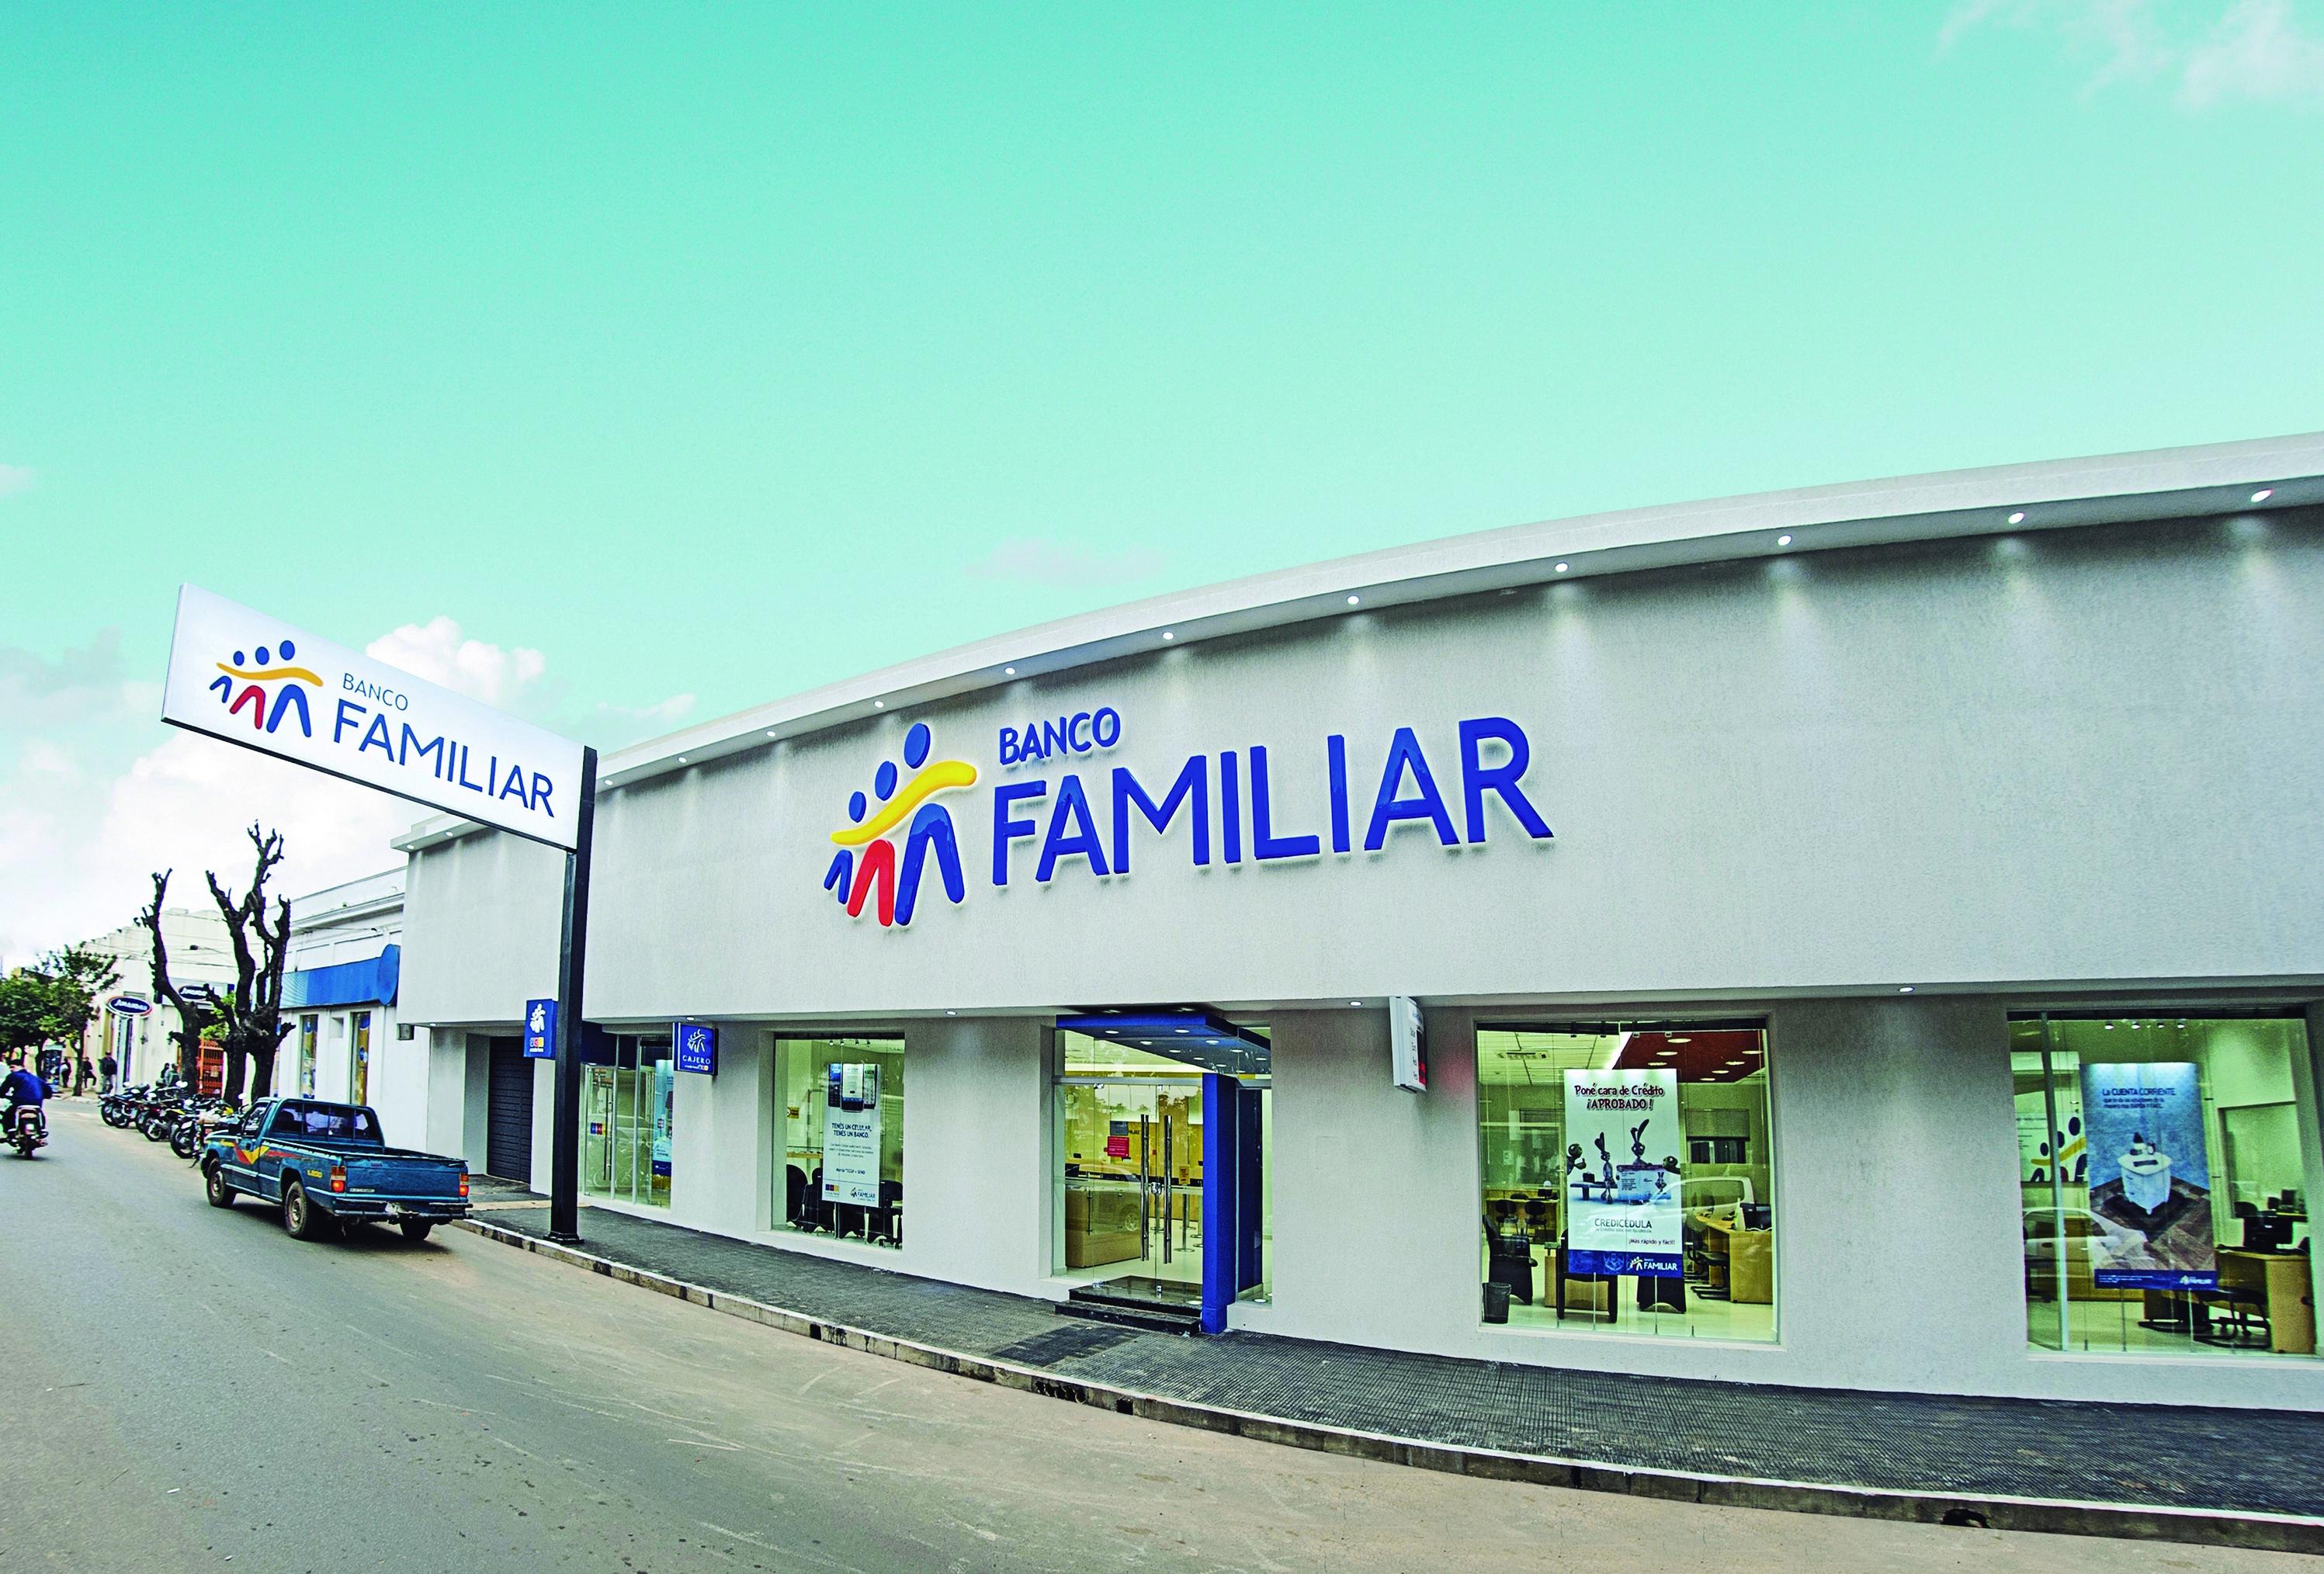 Banco Familiar